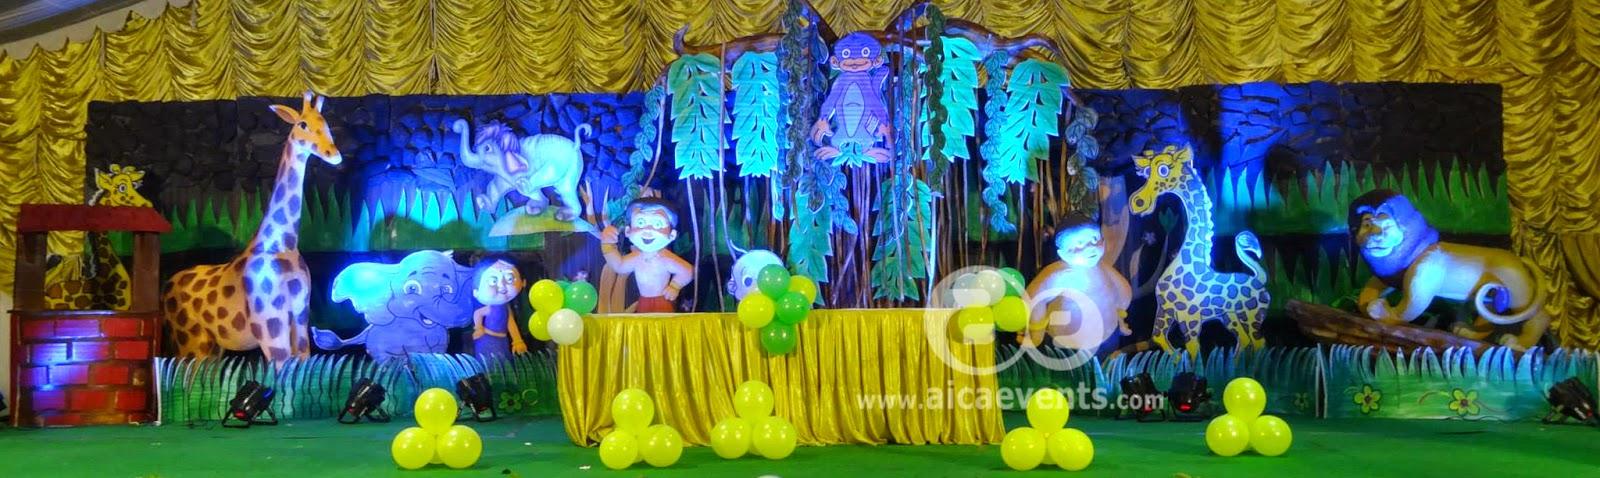 Aicaevents Chota Bheem Theme Party Decorations